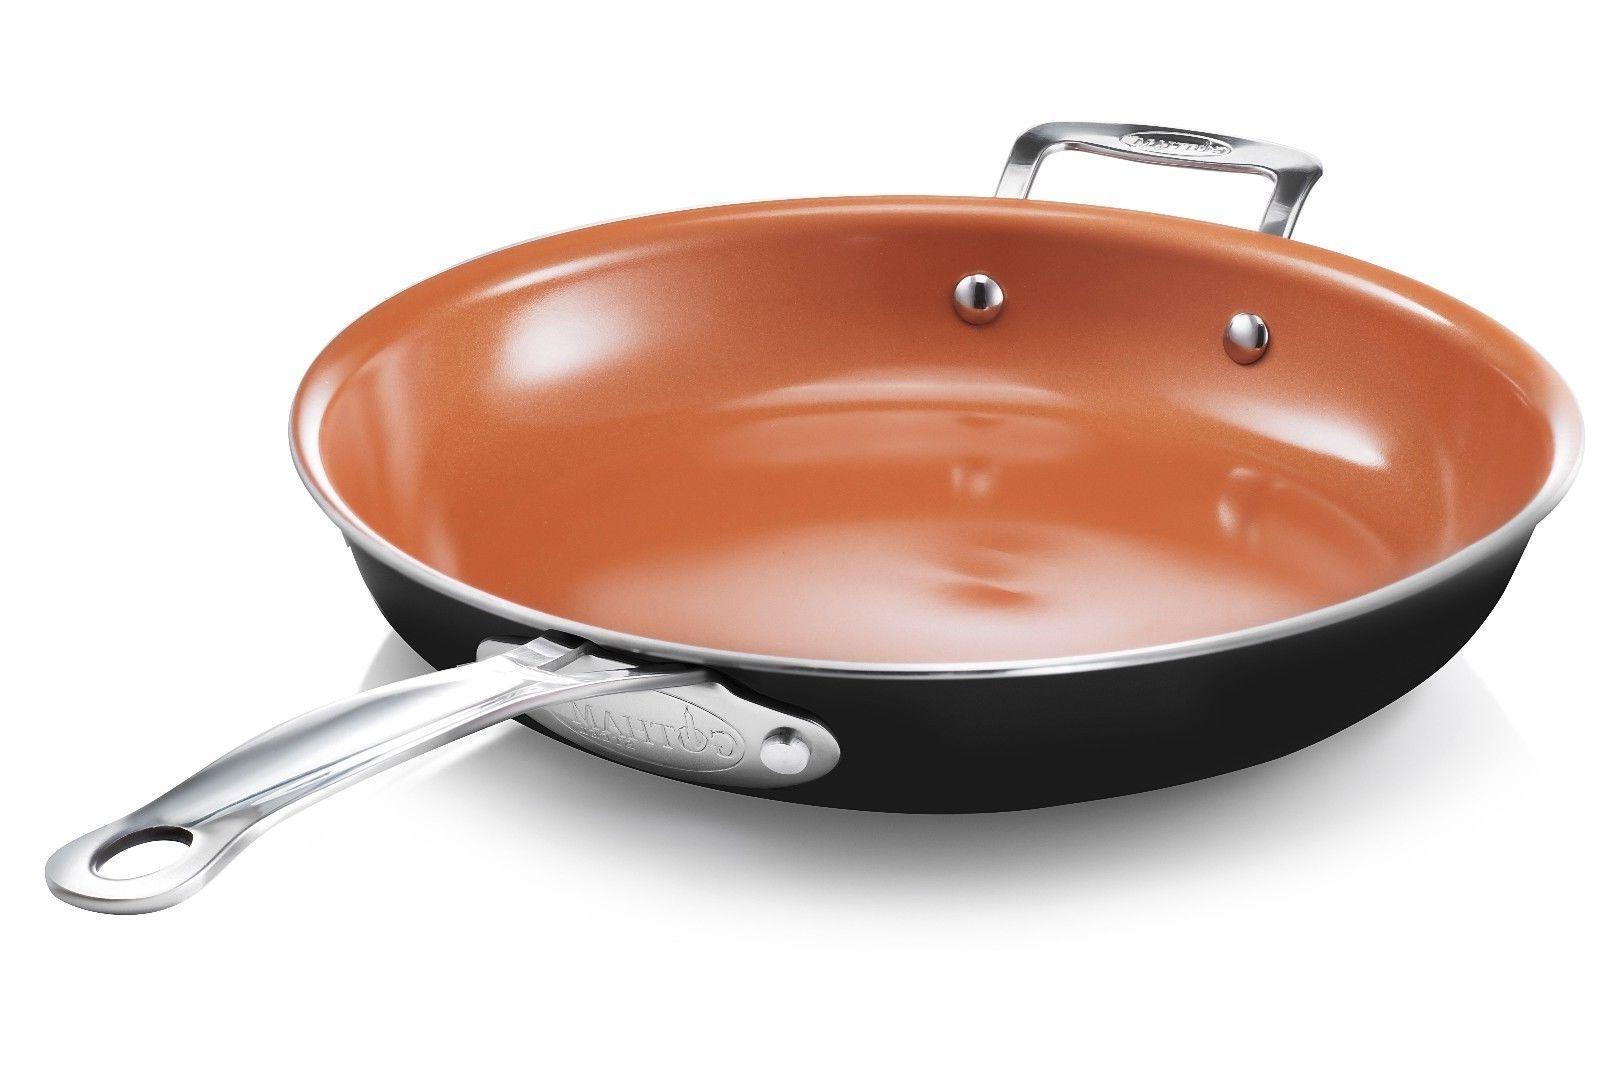 Gotham Steel Kitchen Nonstick & Cookware Colors -NEW